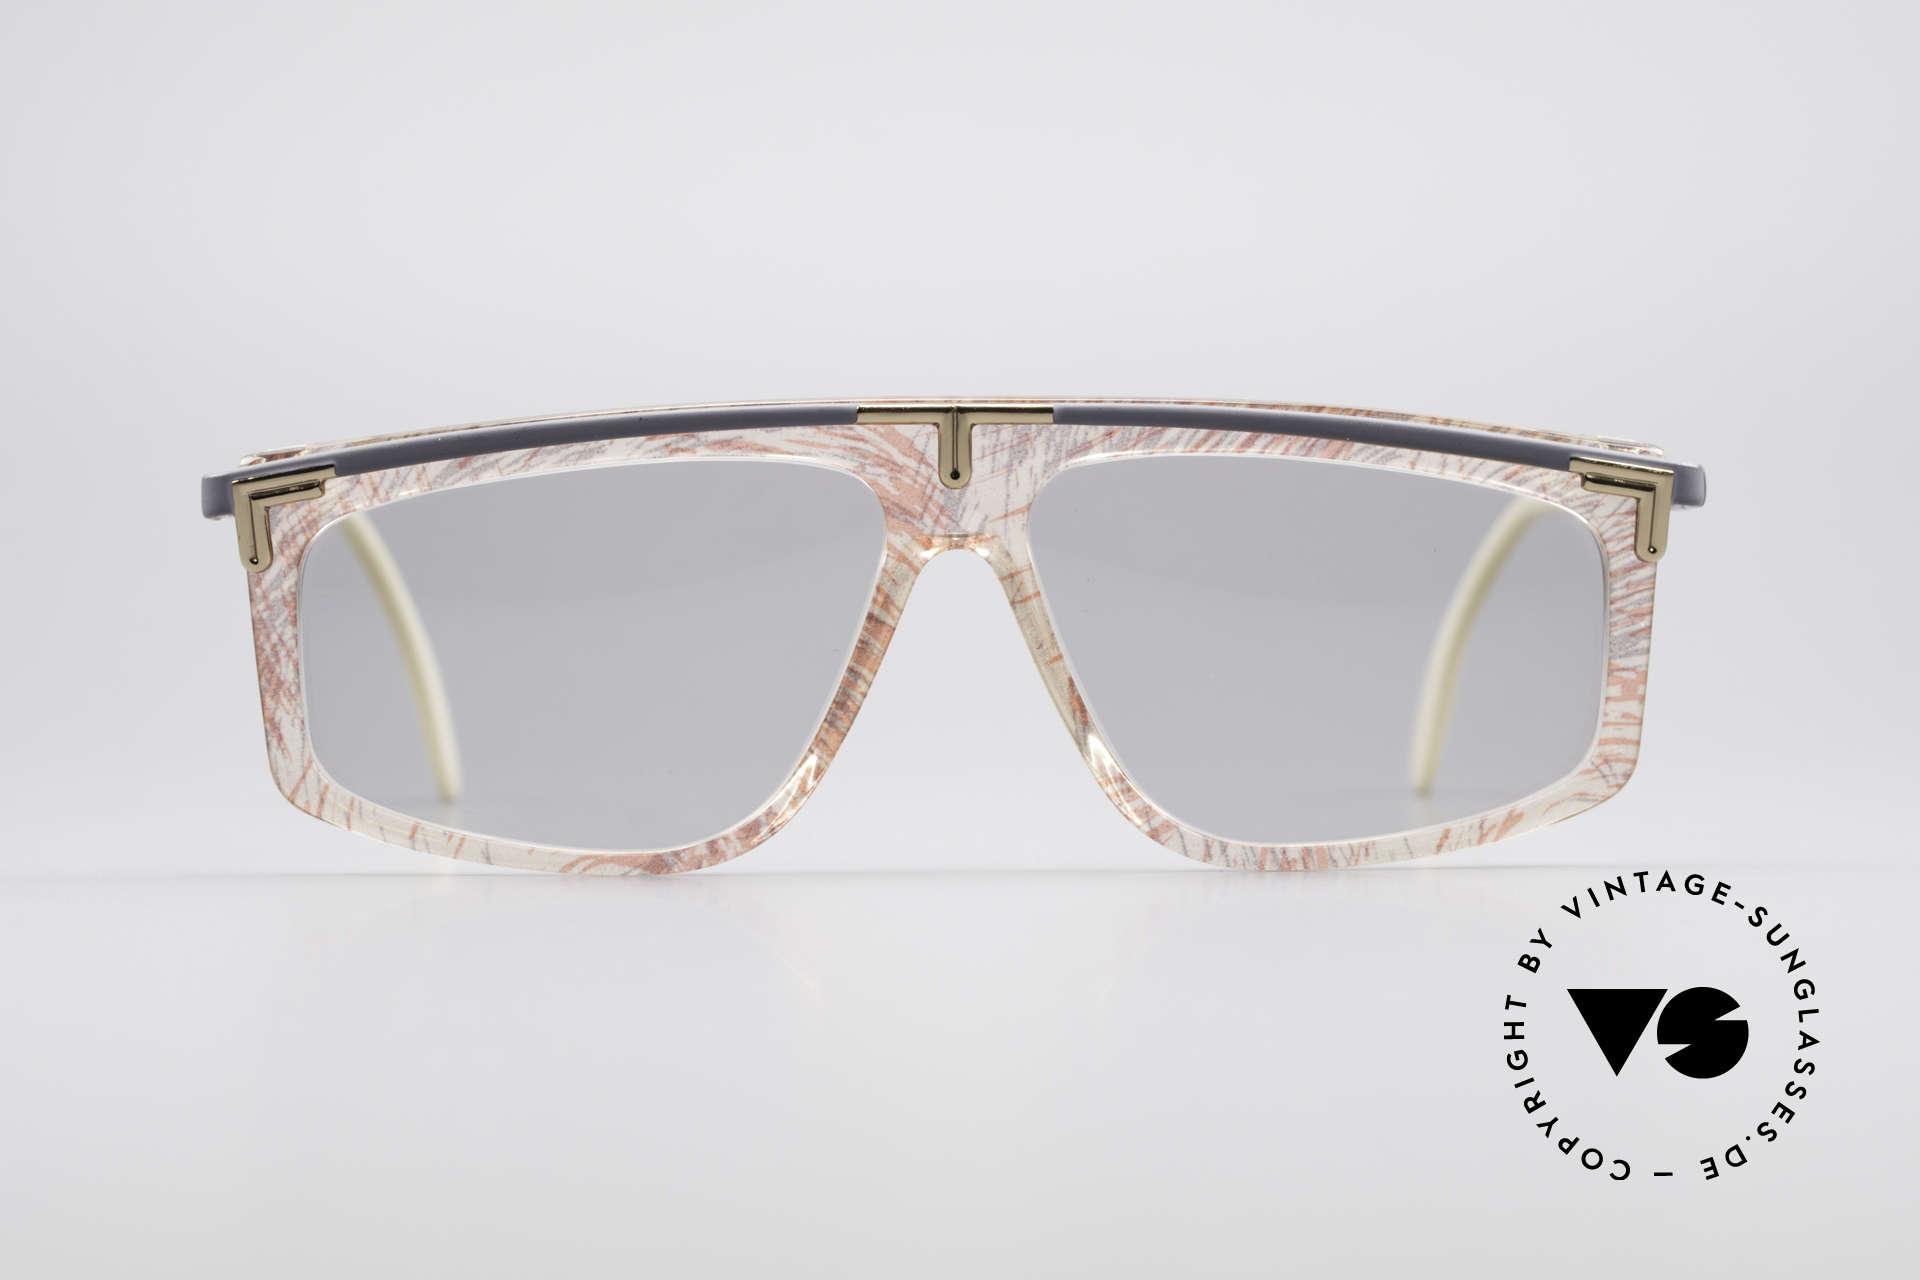 Cazal 190 Old School Hip Hop 1980's, flashy frame pattern by designer Cari Zalloni (CAZAL), Made for Men and Women